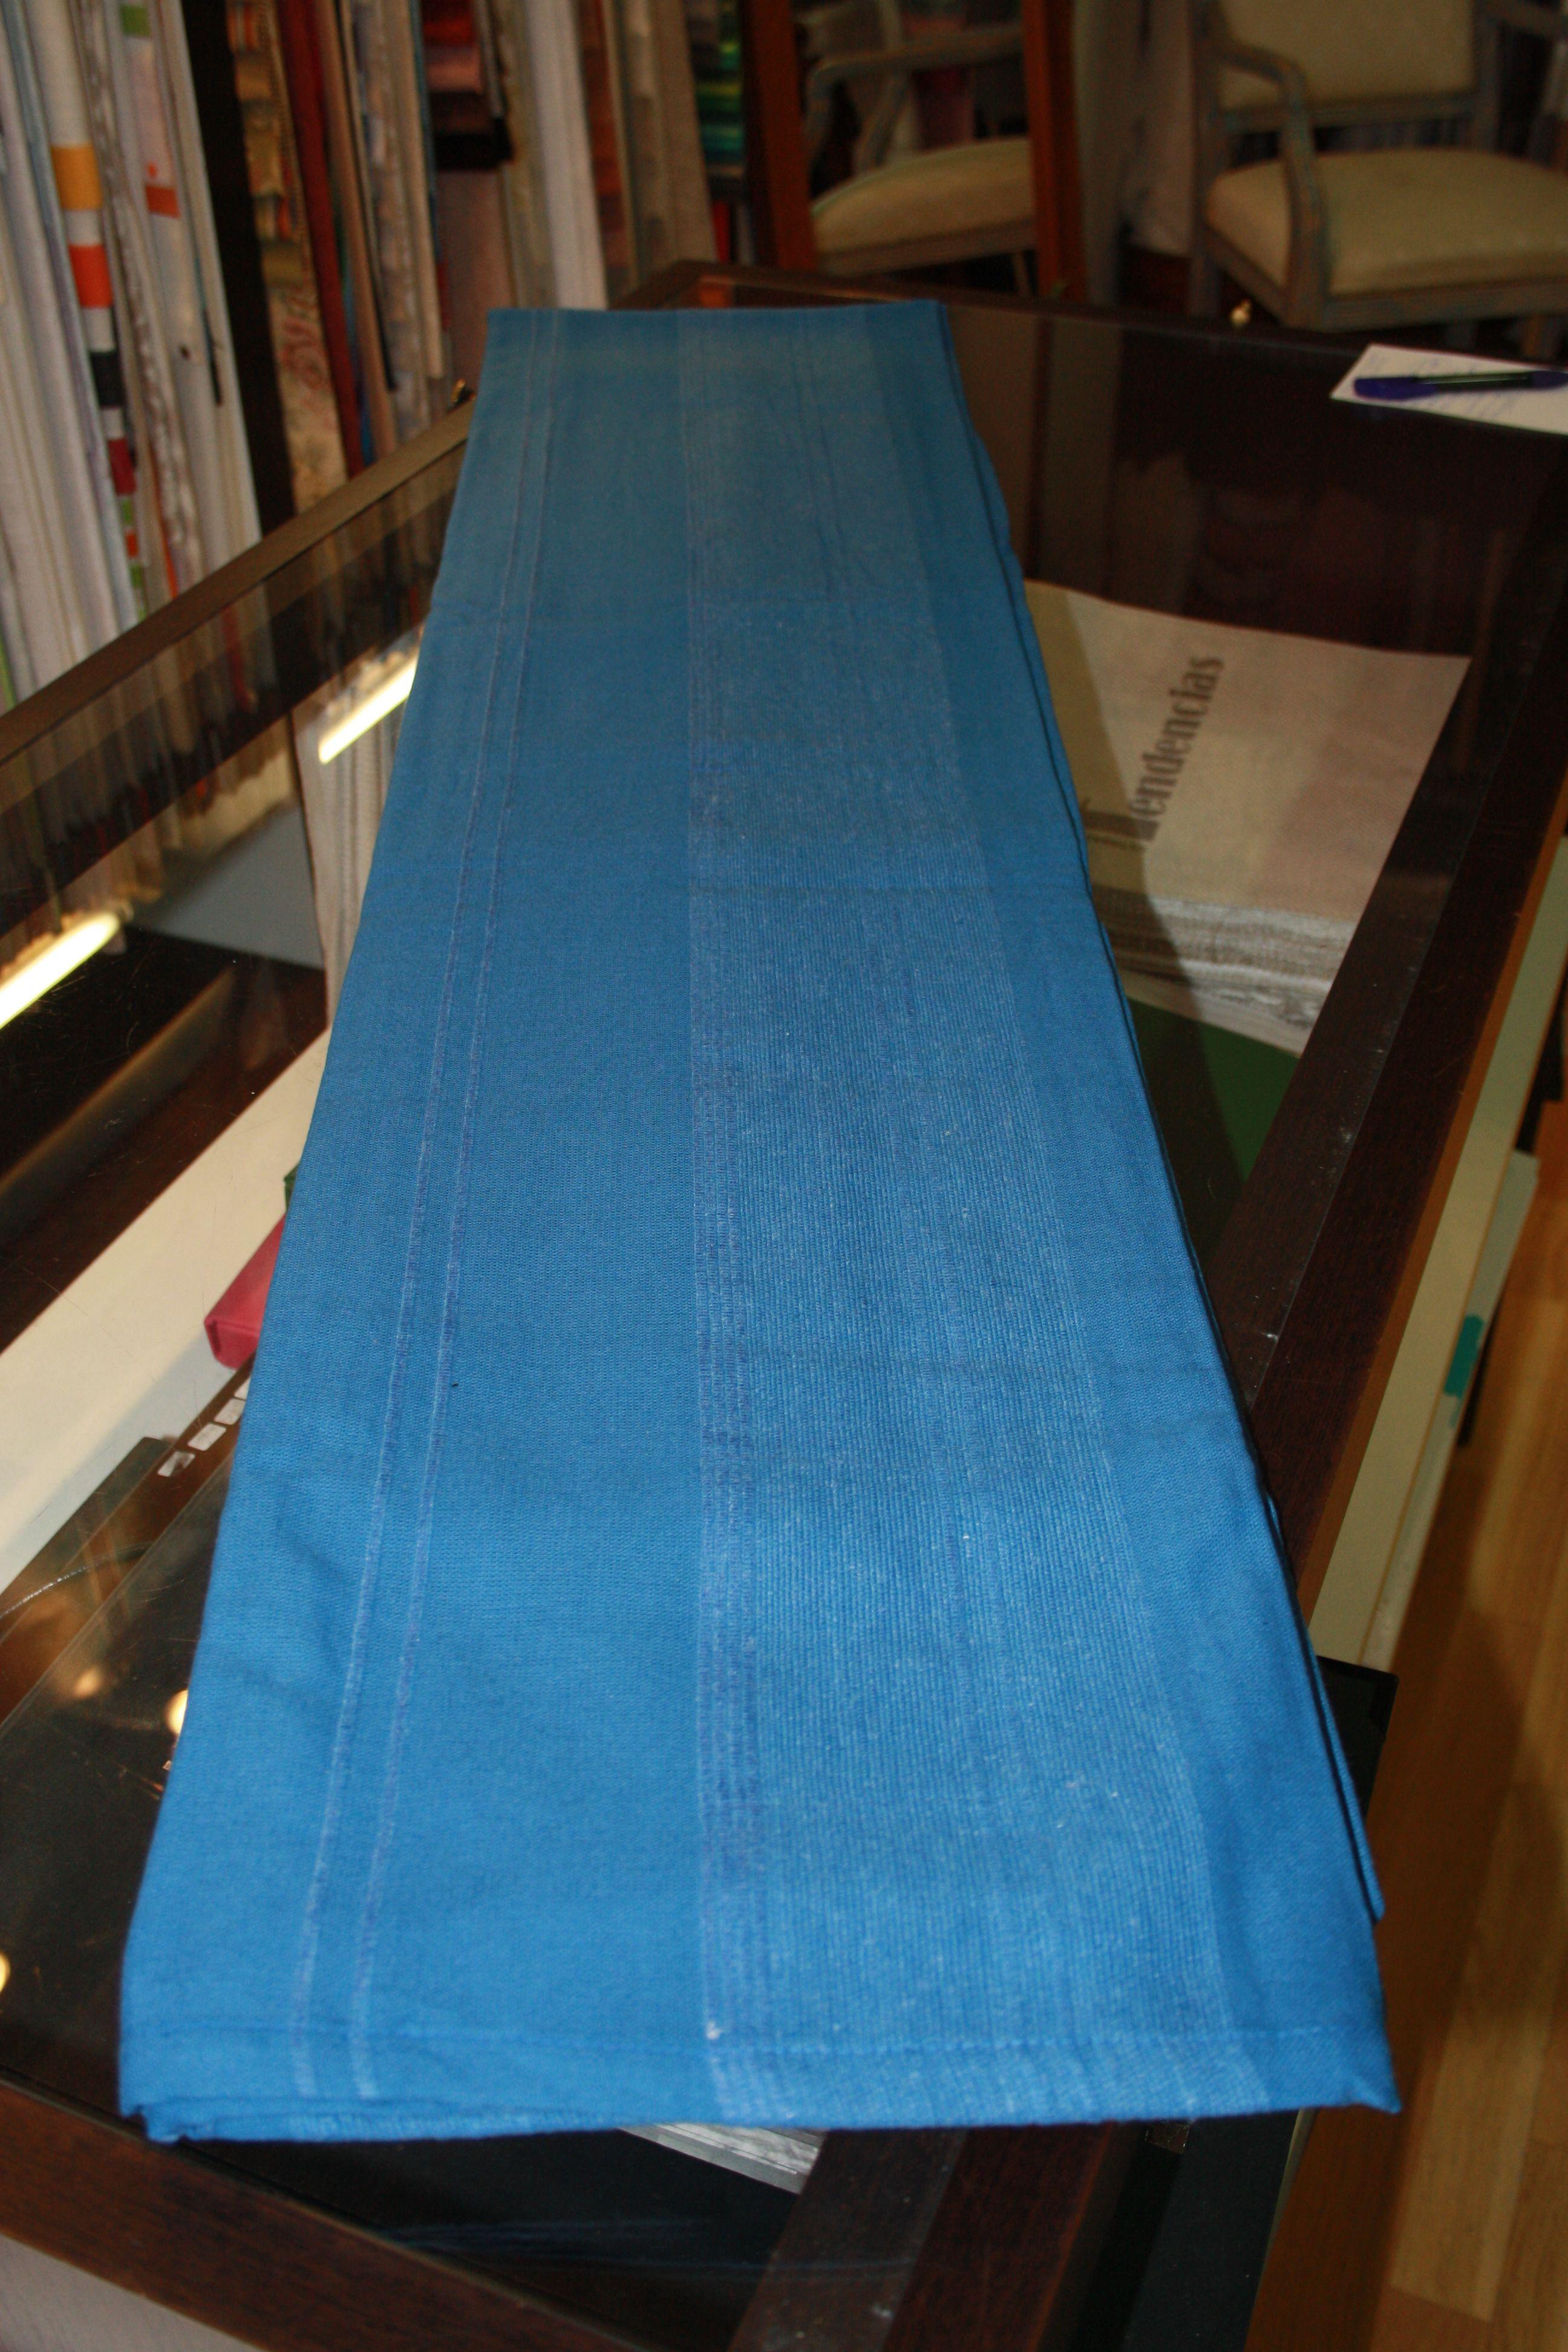 Natura. Colcha multiusos azul. 100% algodón 170*250: Catálogo de La Cibeles